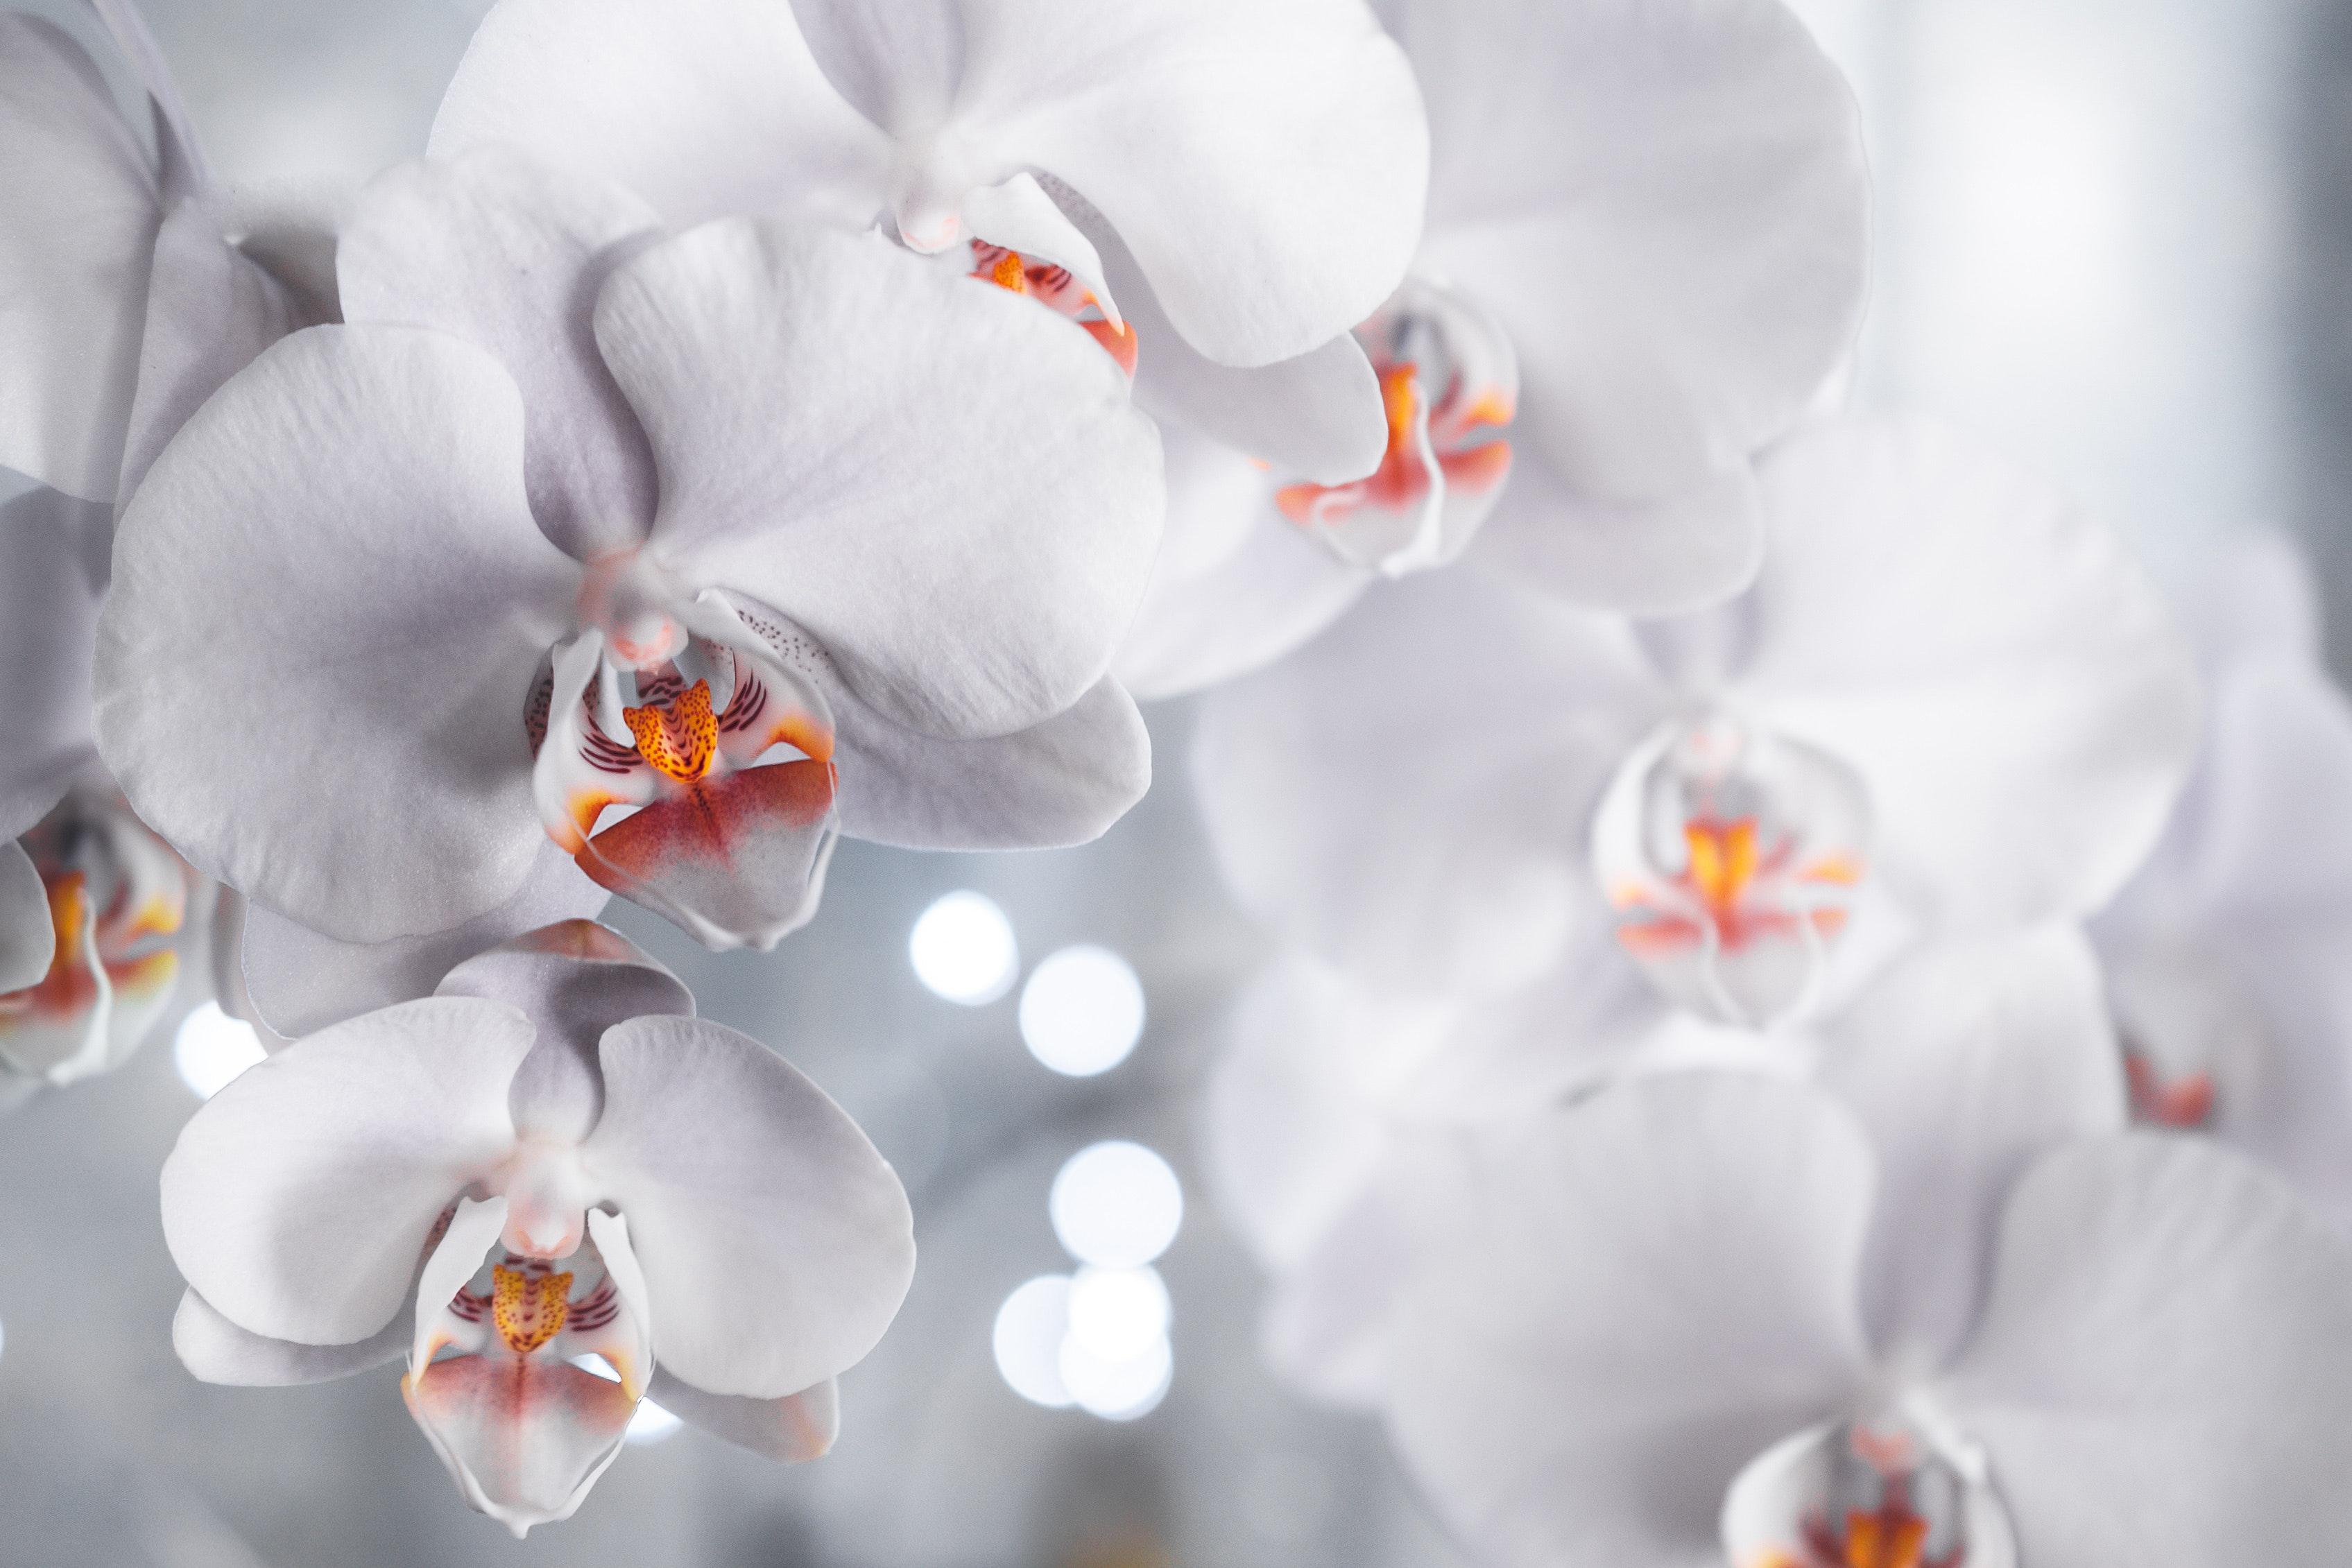 bloom-blossom-close-up-2291811